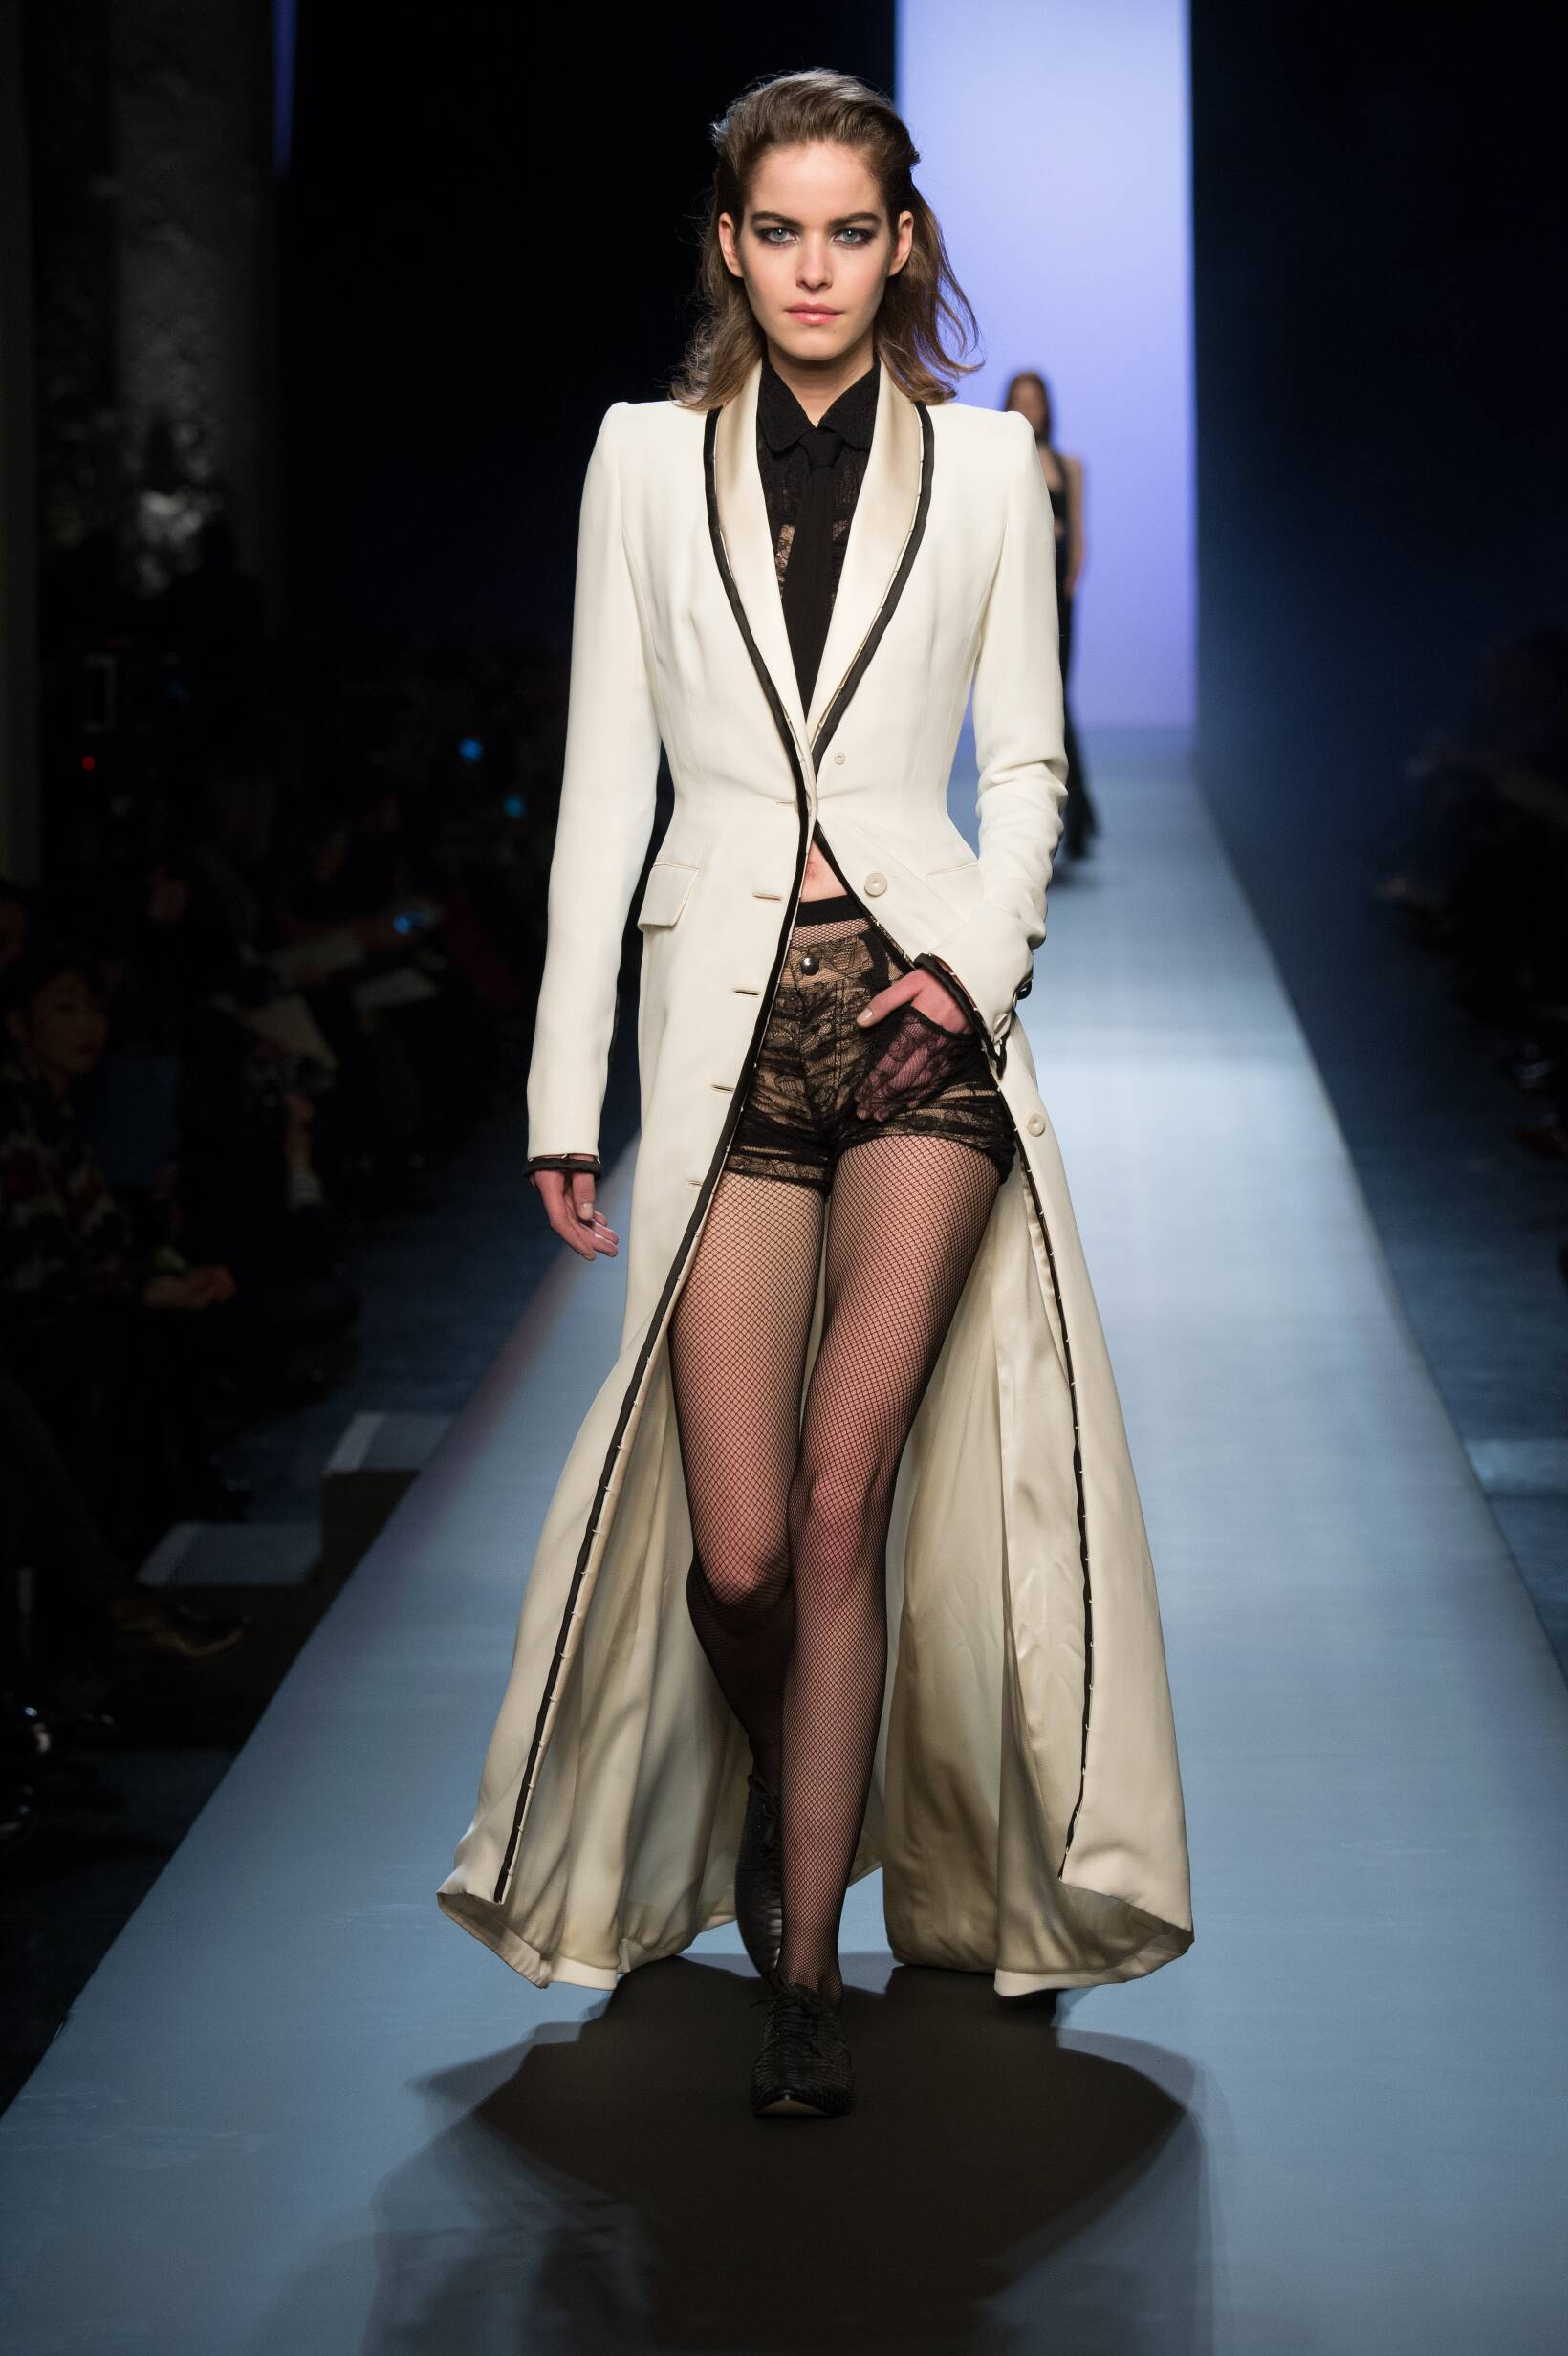 Jean Paul Gaultier Haute Couture Collection Woman 2015